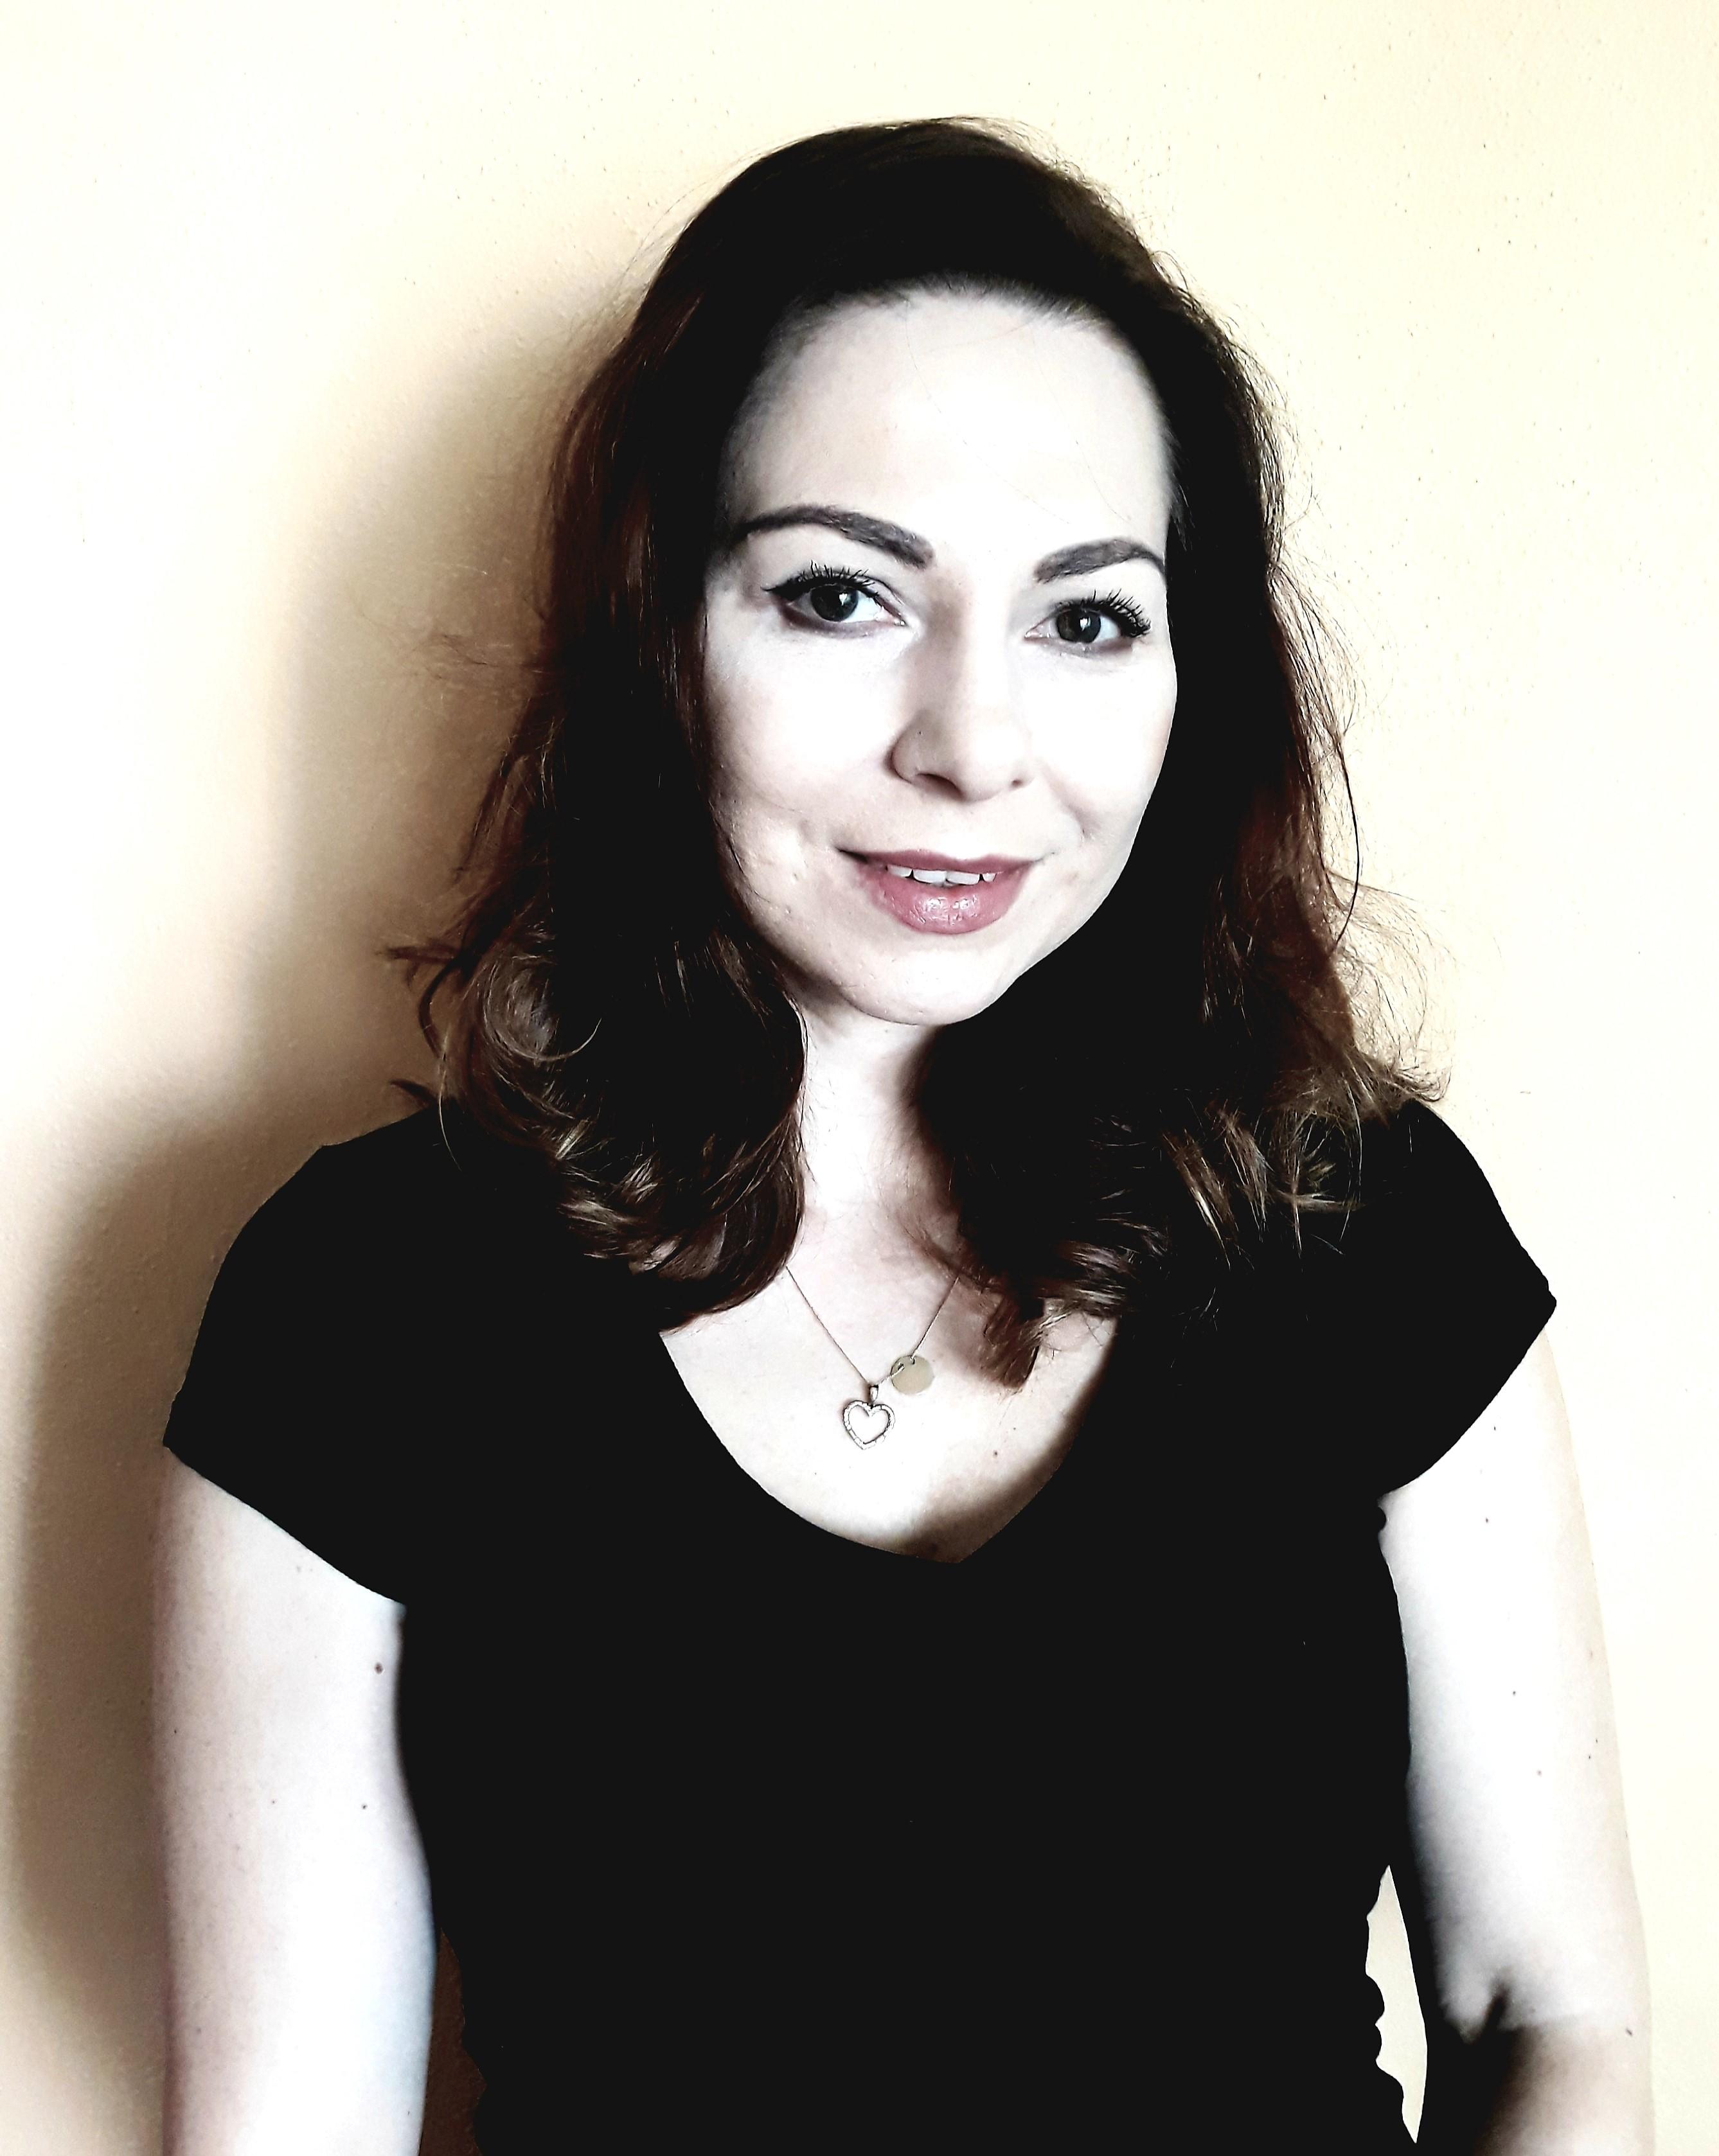 Barbara Gołebiowska